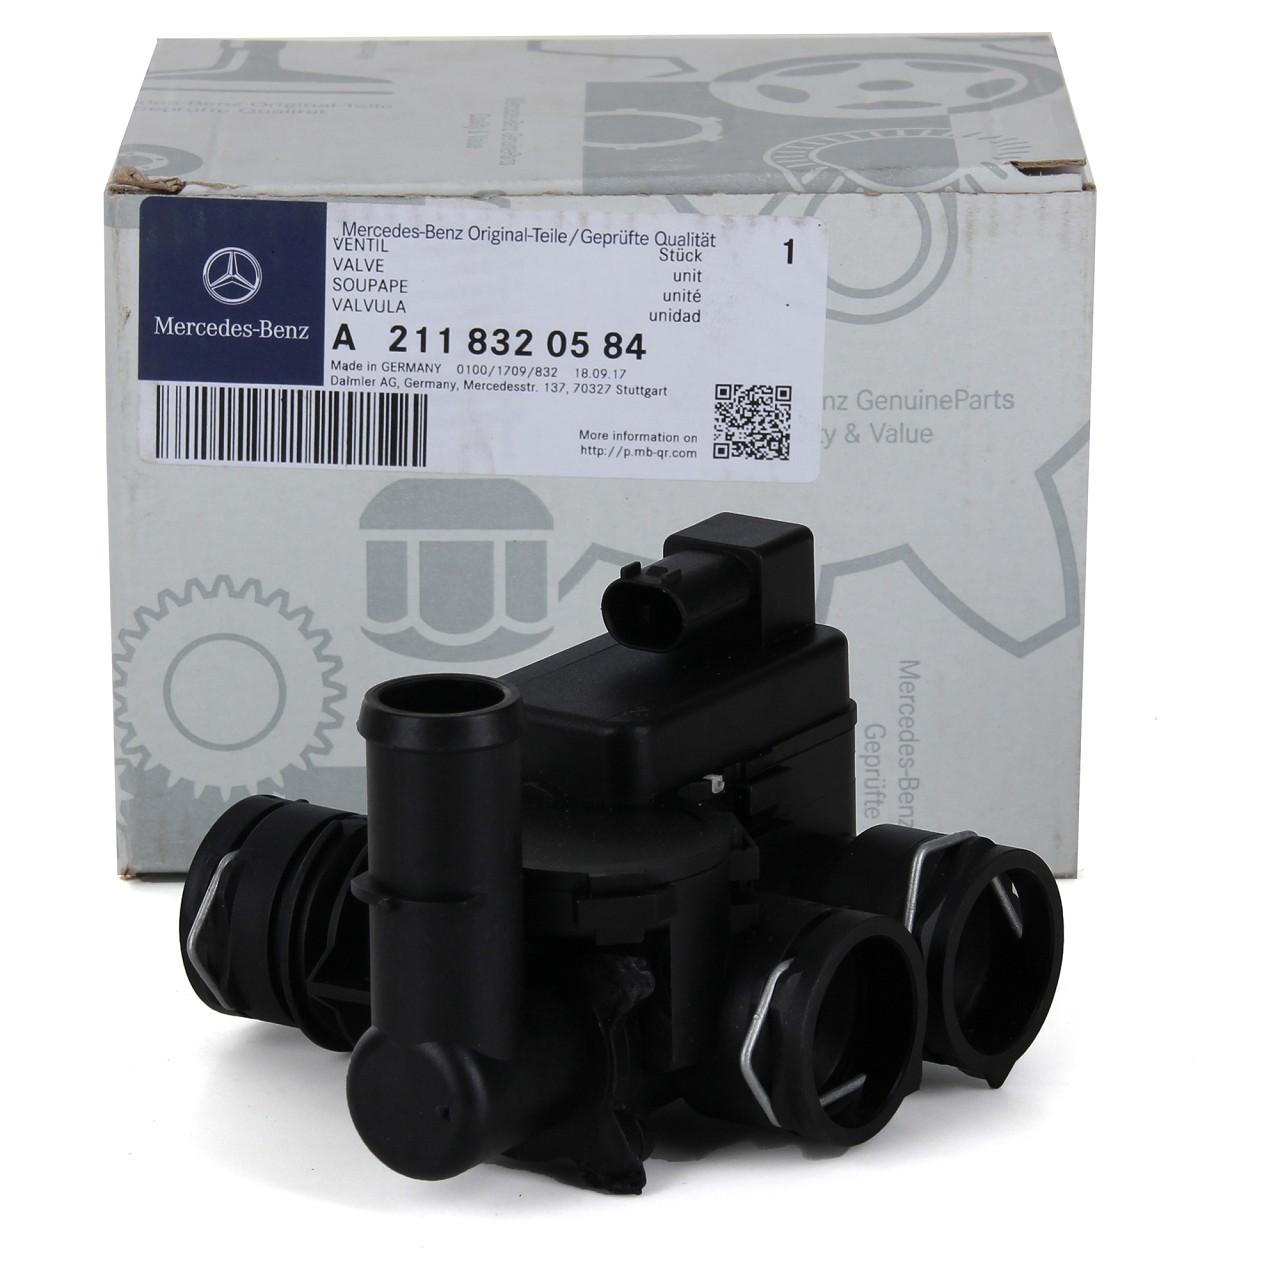 ORIGINAL Mercedes-Benz Kühlmittelregelventil Heizungsventil CLS C219 2118320584